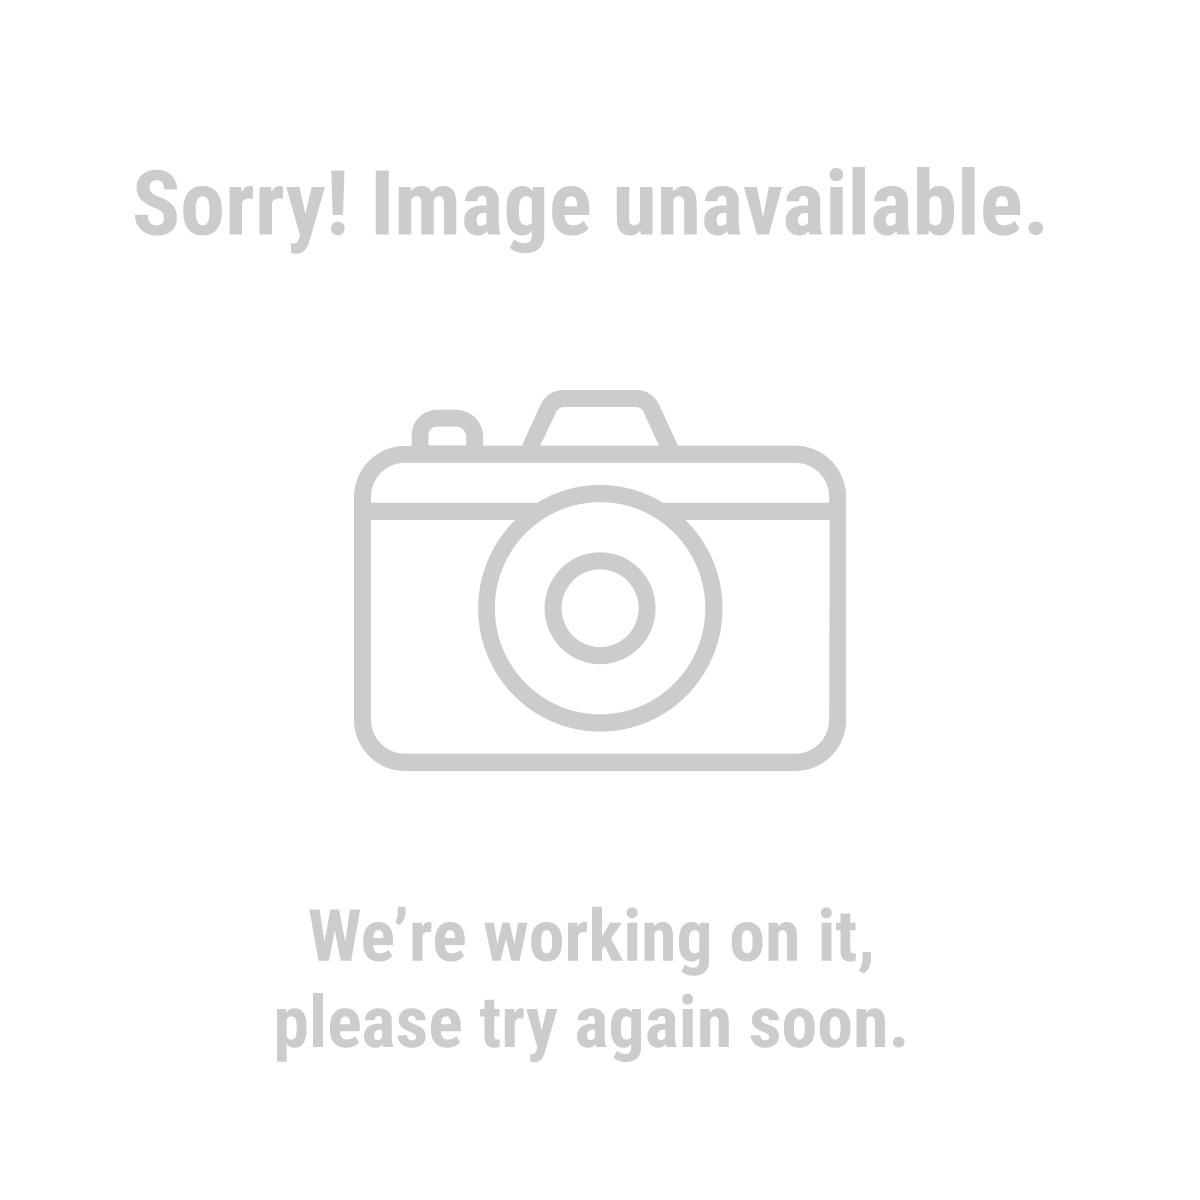 Haul-Master® 631 2 Ton Chain Hoist